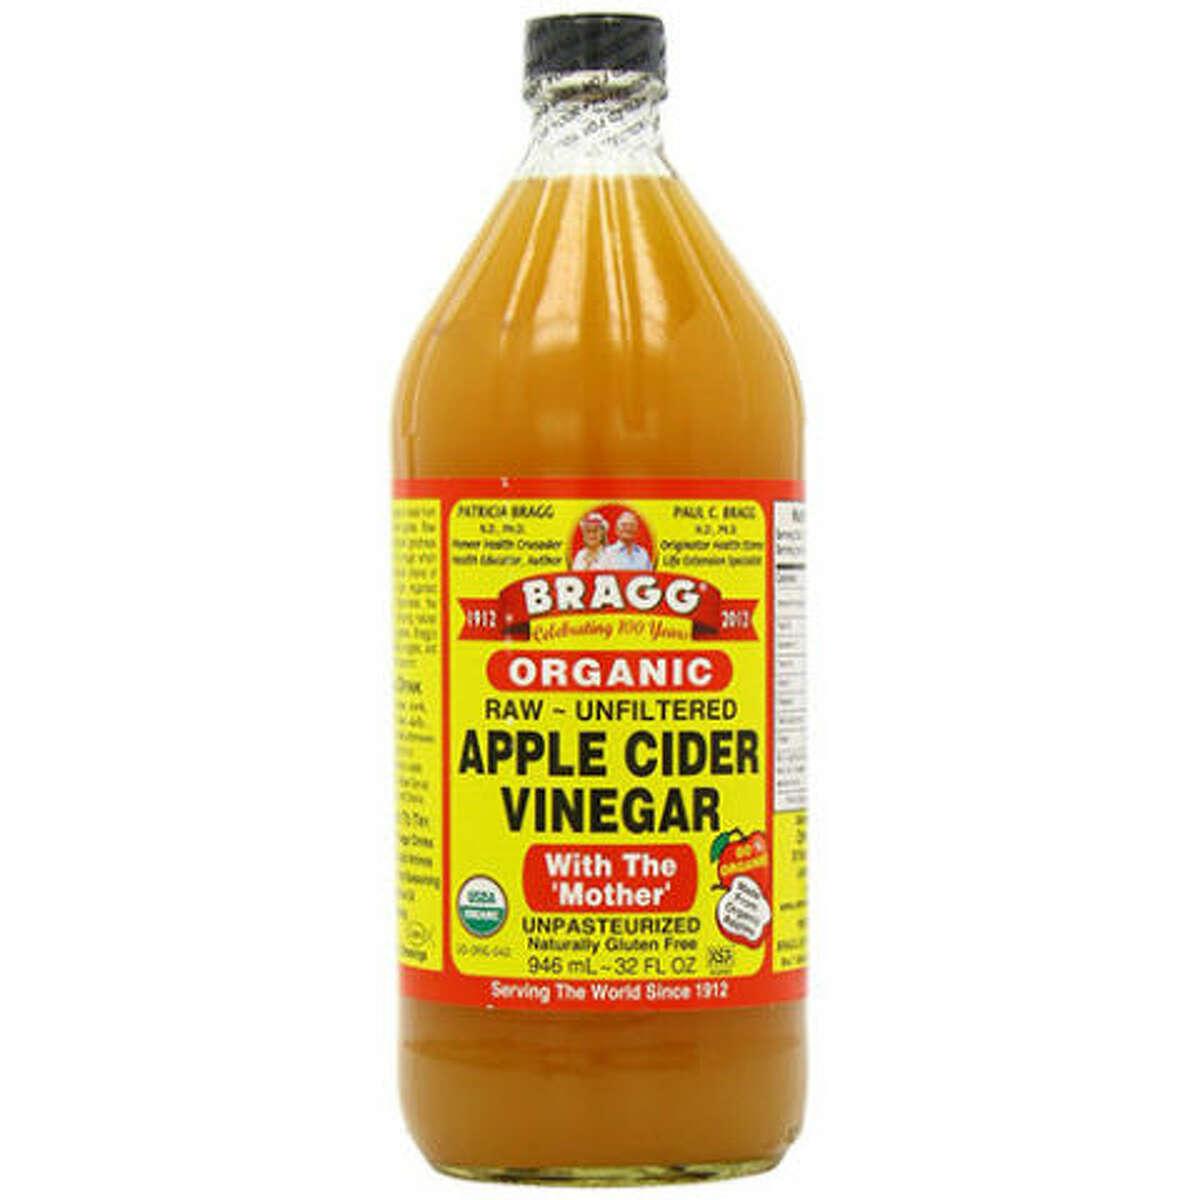 Bragg Usda Organic Raw Apple Cider Vinegar, 16 Fluid Ounce Amazon: $6.90 (not Prime)AmazonFresh: $5.09 Whole Foods: $3.99